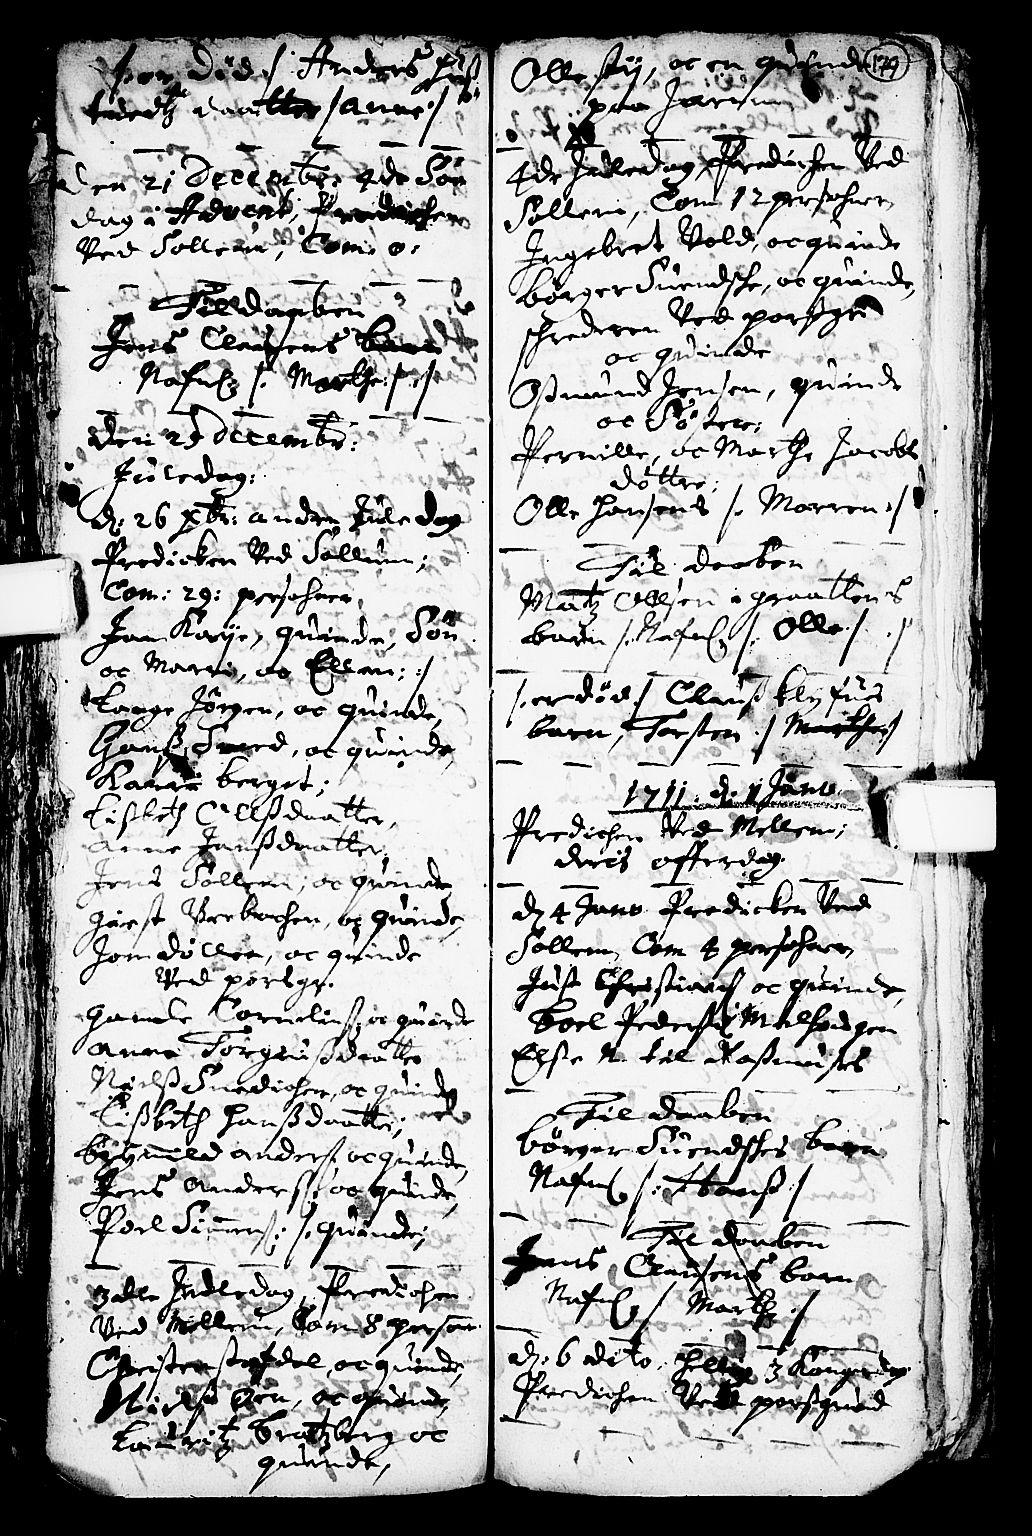 SAKO, Solum kirkebøker, F/Fa/L0001: Ministerialbok nr. I 1, 1701-1716, s. 179